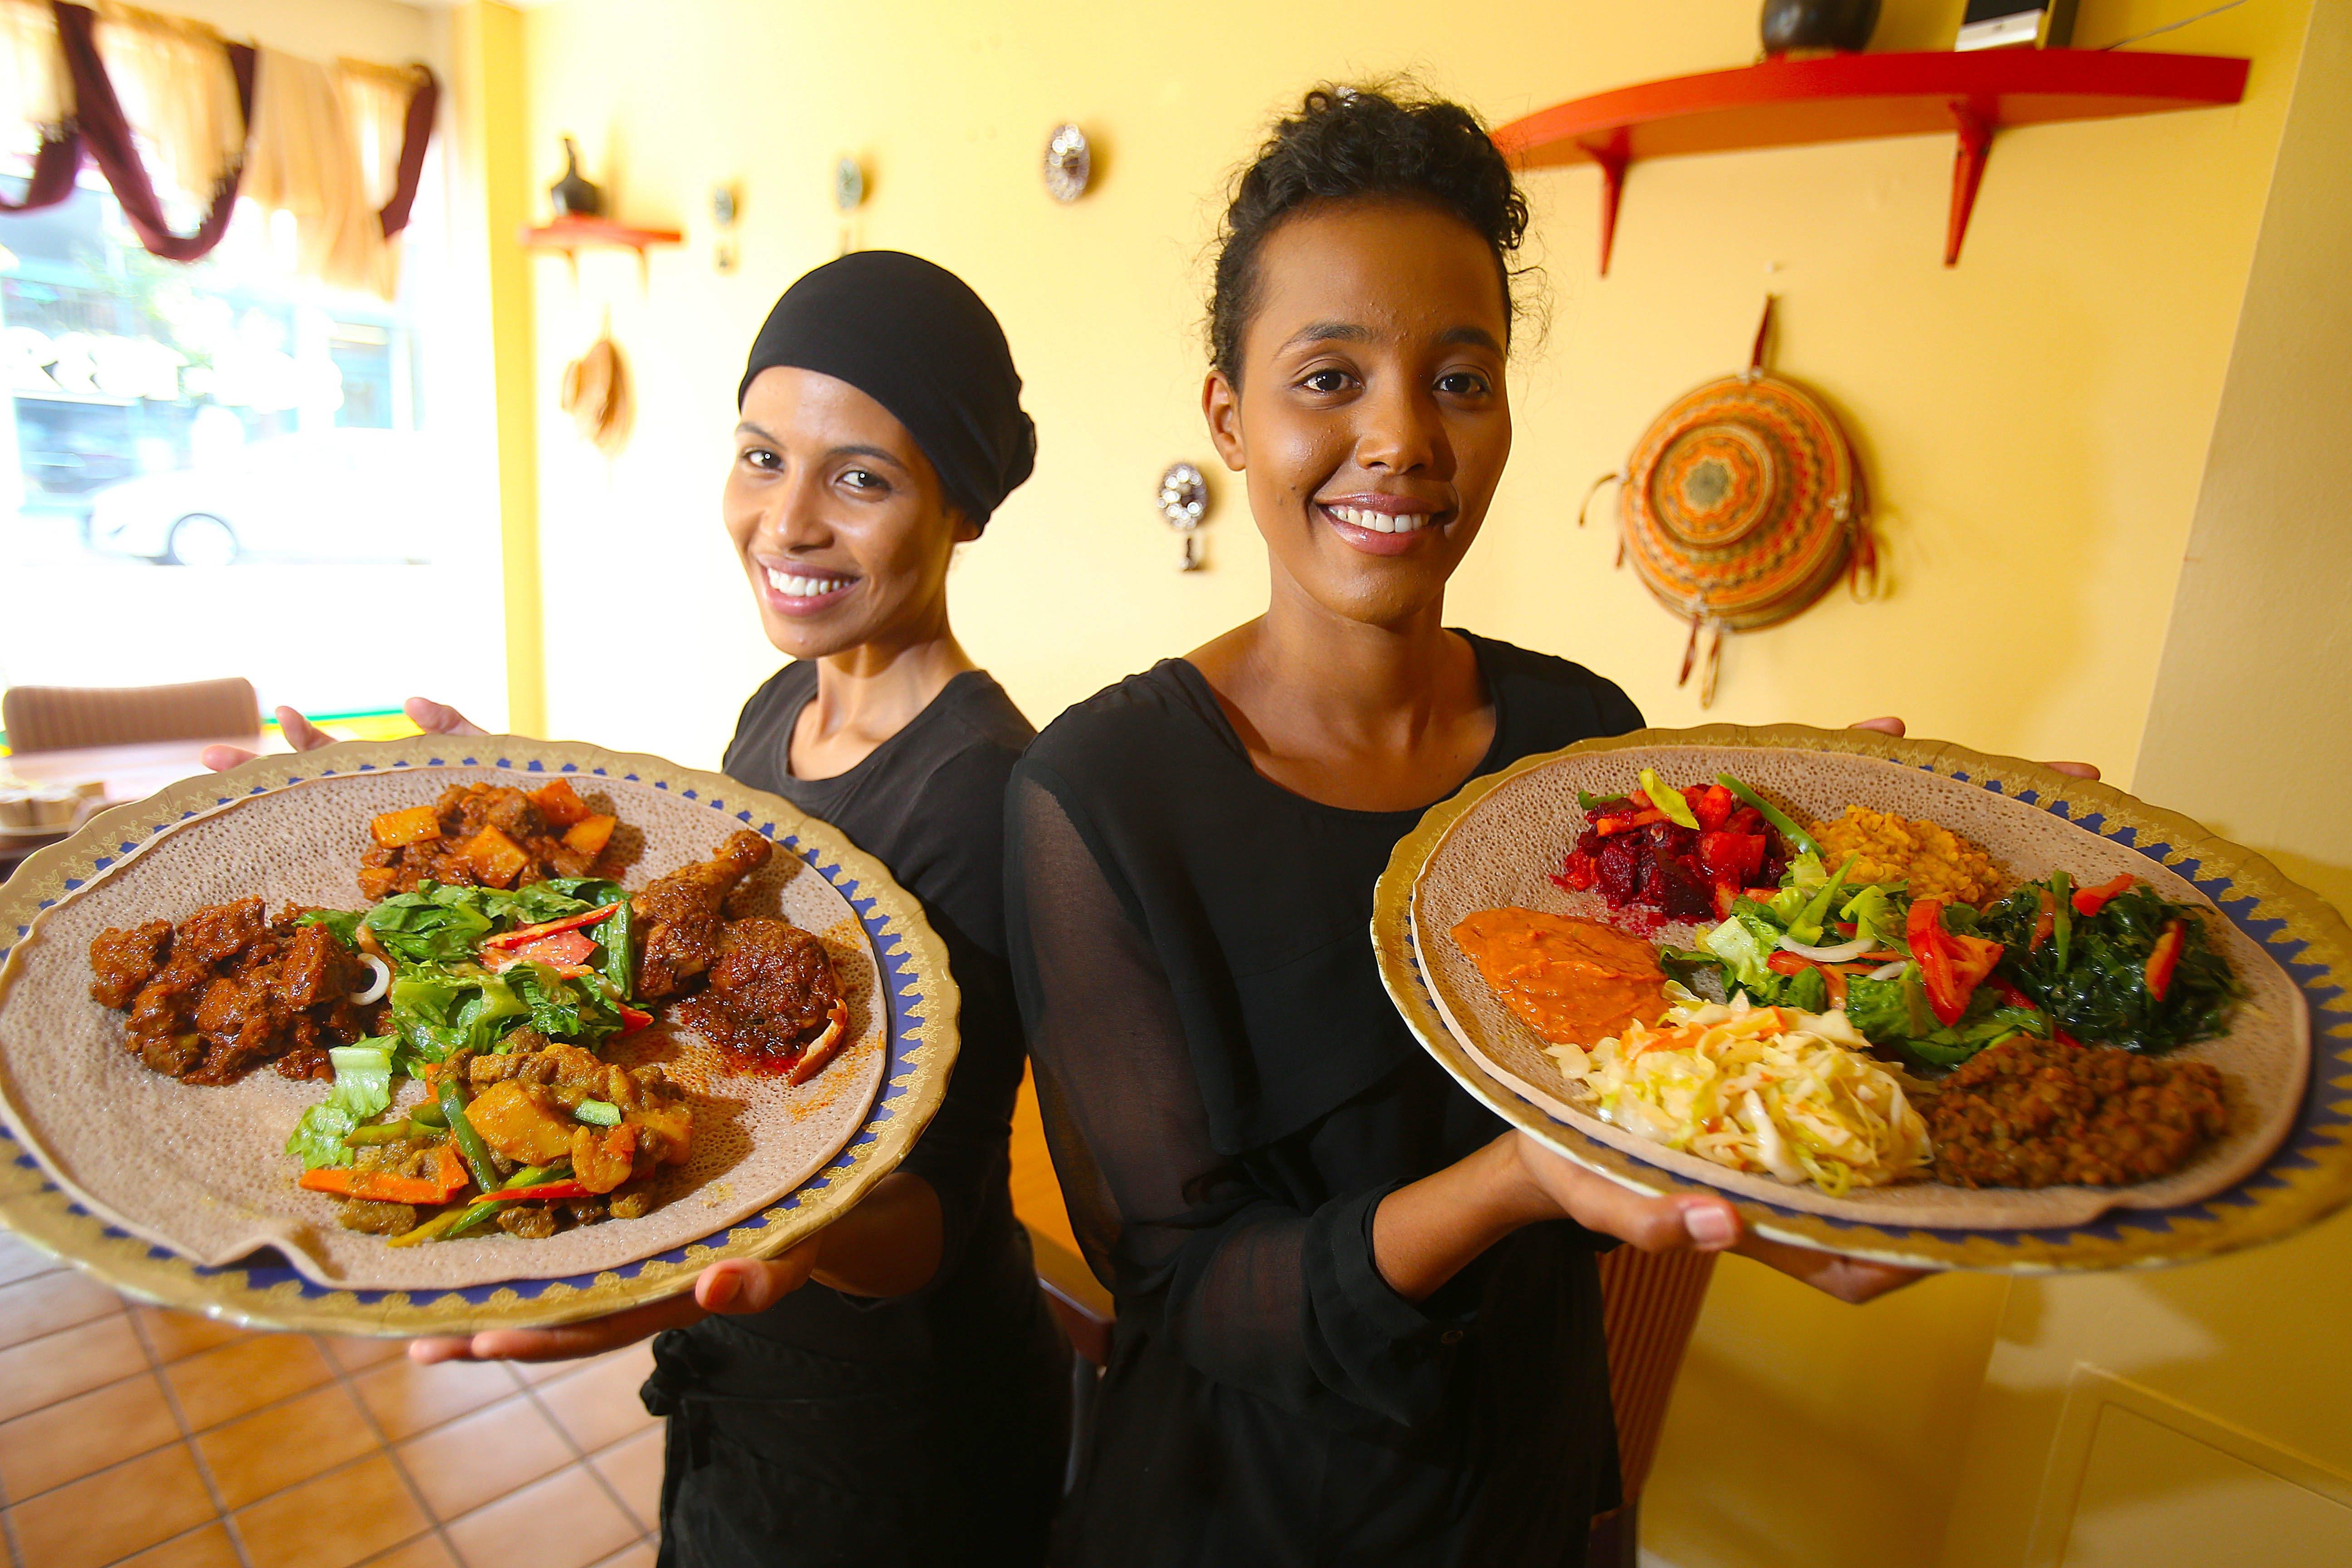 Owner Iman Gatur, left, shows off the Meat Combo and her sister Sabat Gatur holds the Veggie Combo at Gatur's Ethiopian Restaurant on Allen Street. (Robert Kirkham/Buffalo News)